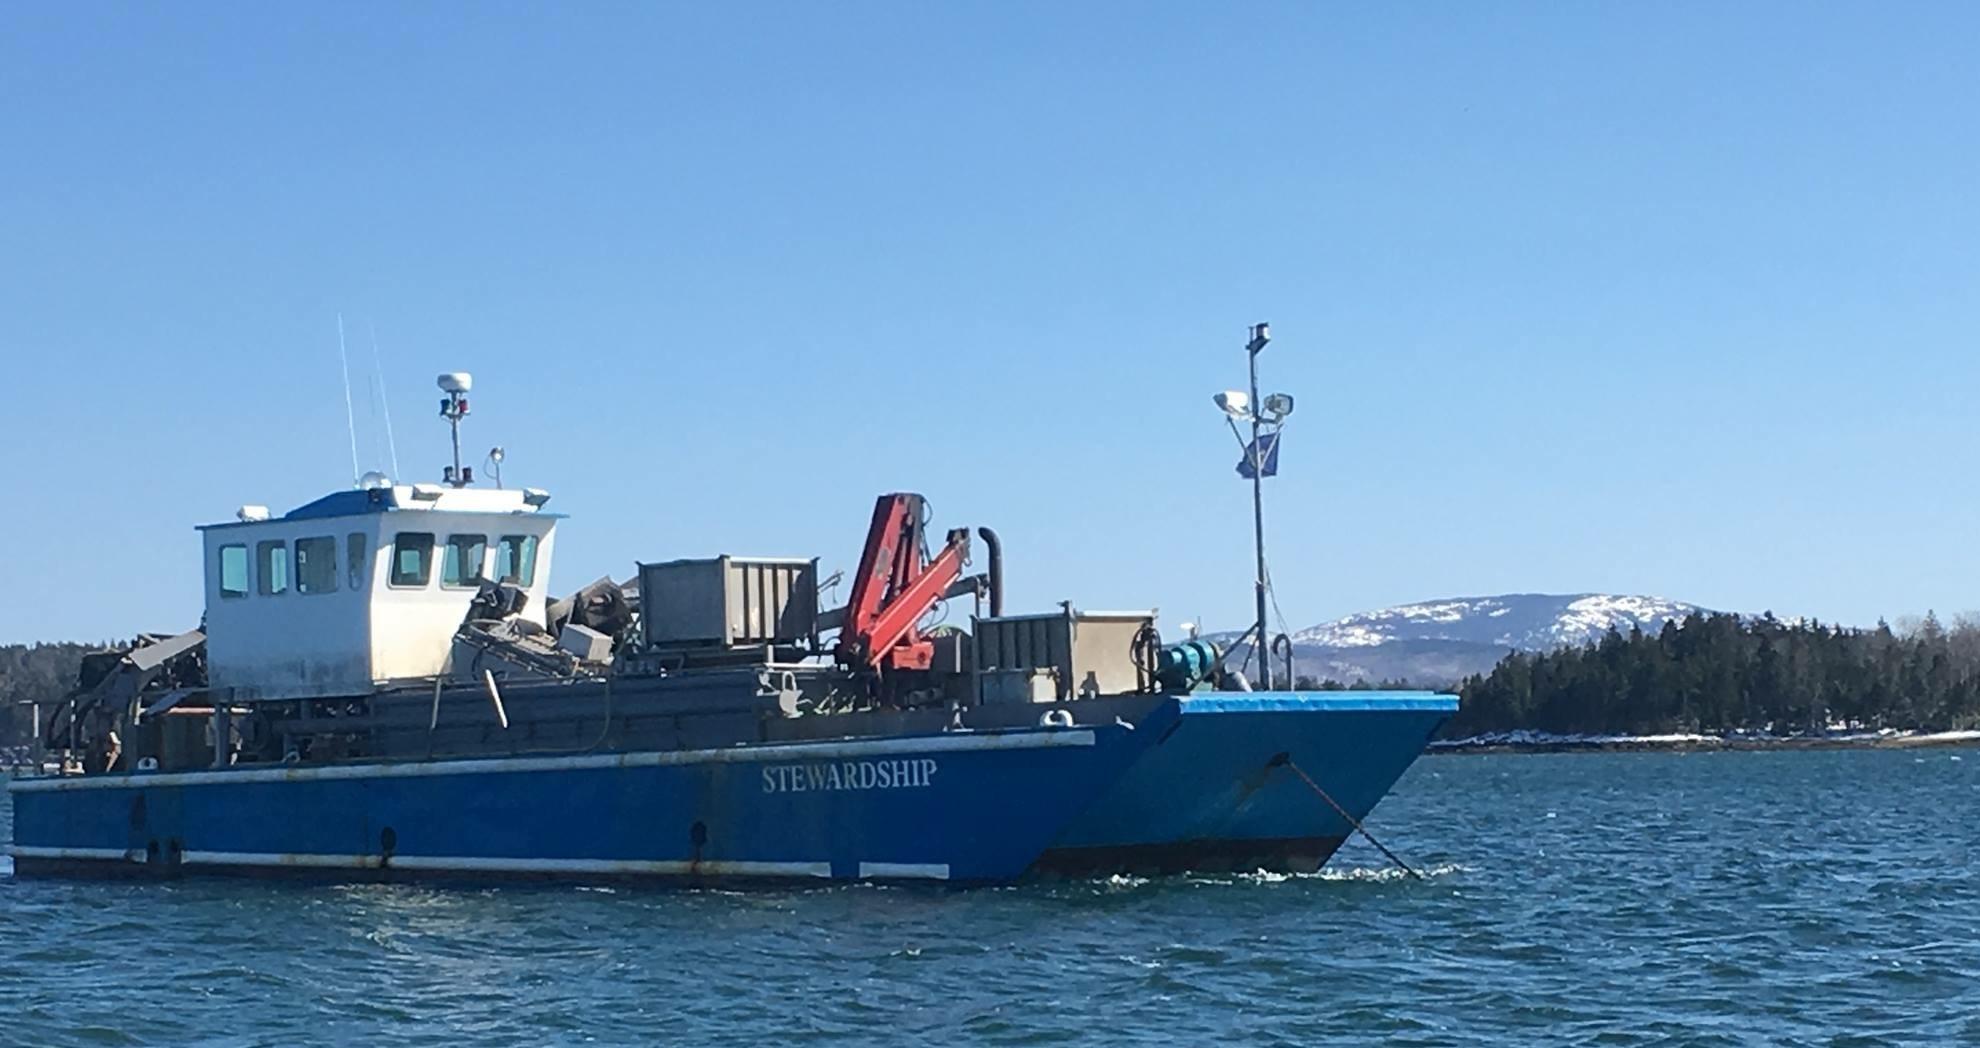 The Stewardship mussel vessel